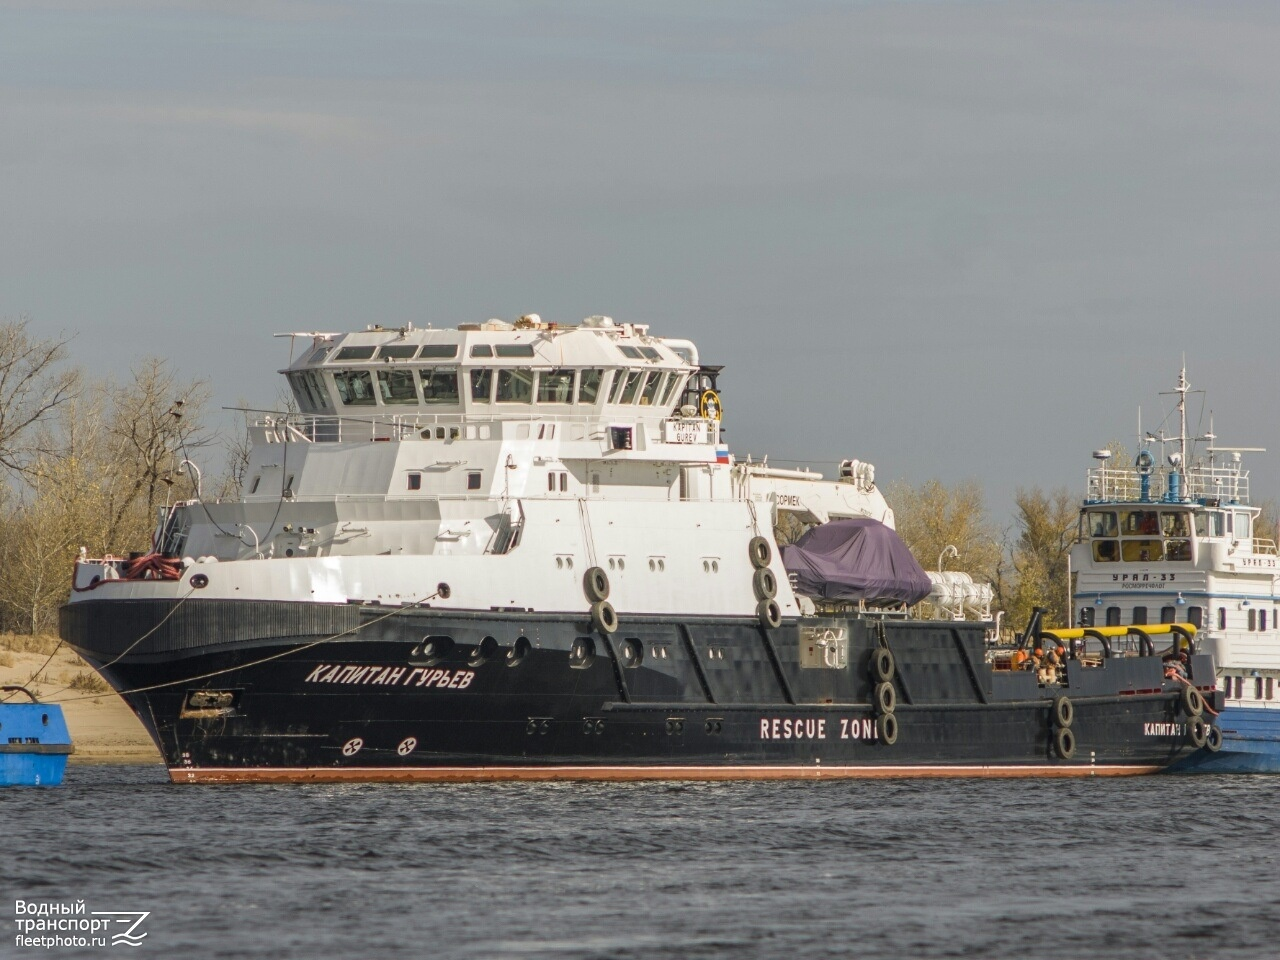 Картинки по запросу судно «Капитан Гурьев» проекта 22870